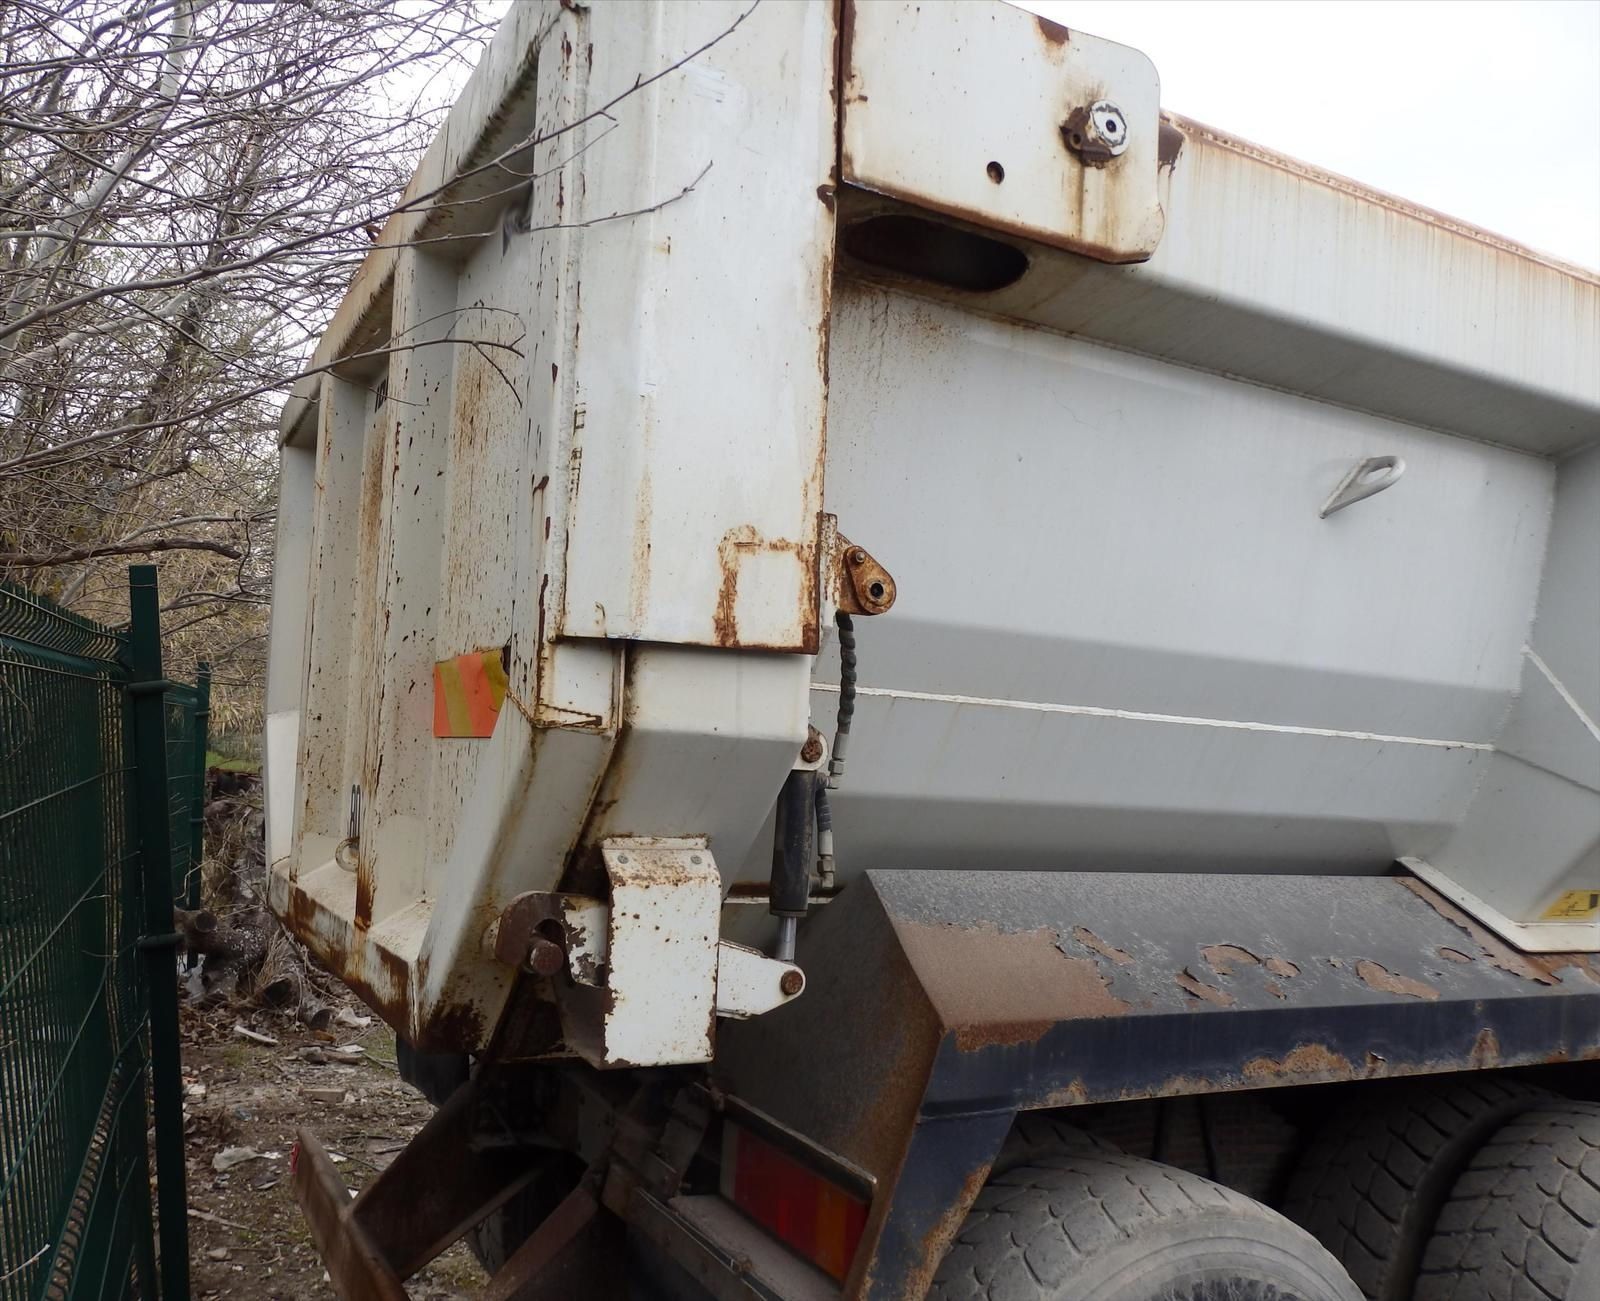 Camion IVECO TRAKKER 450 E5 8x4 Benne Enrochement Tel: 0608066192